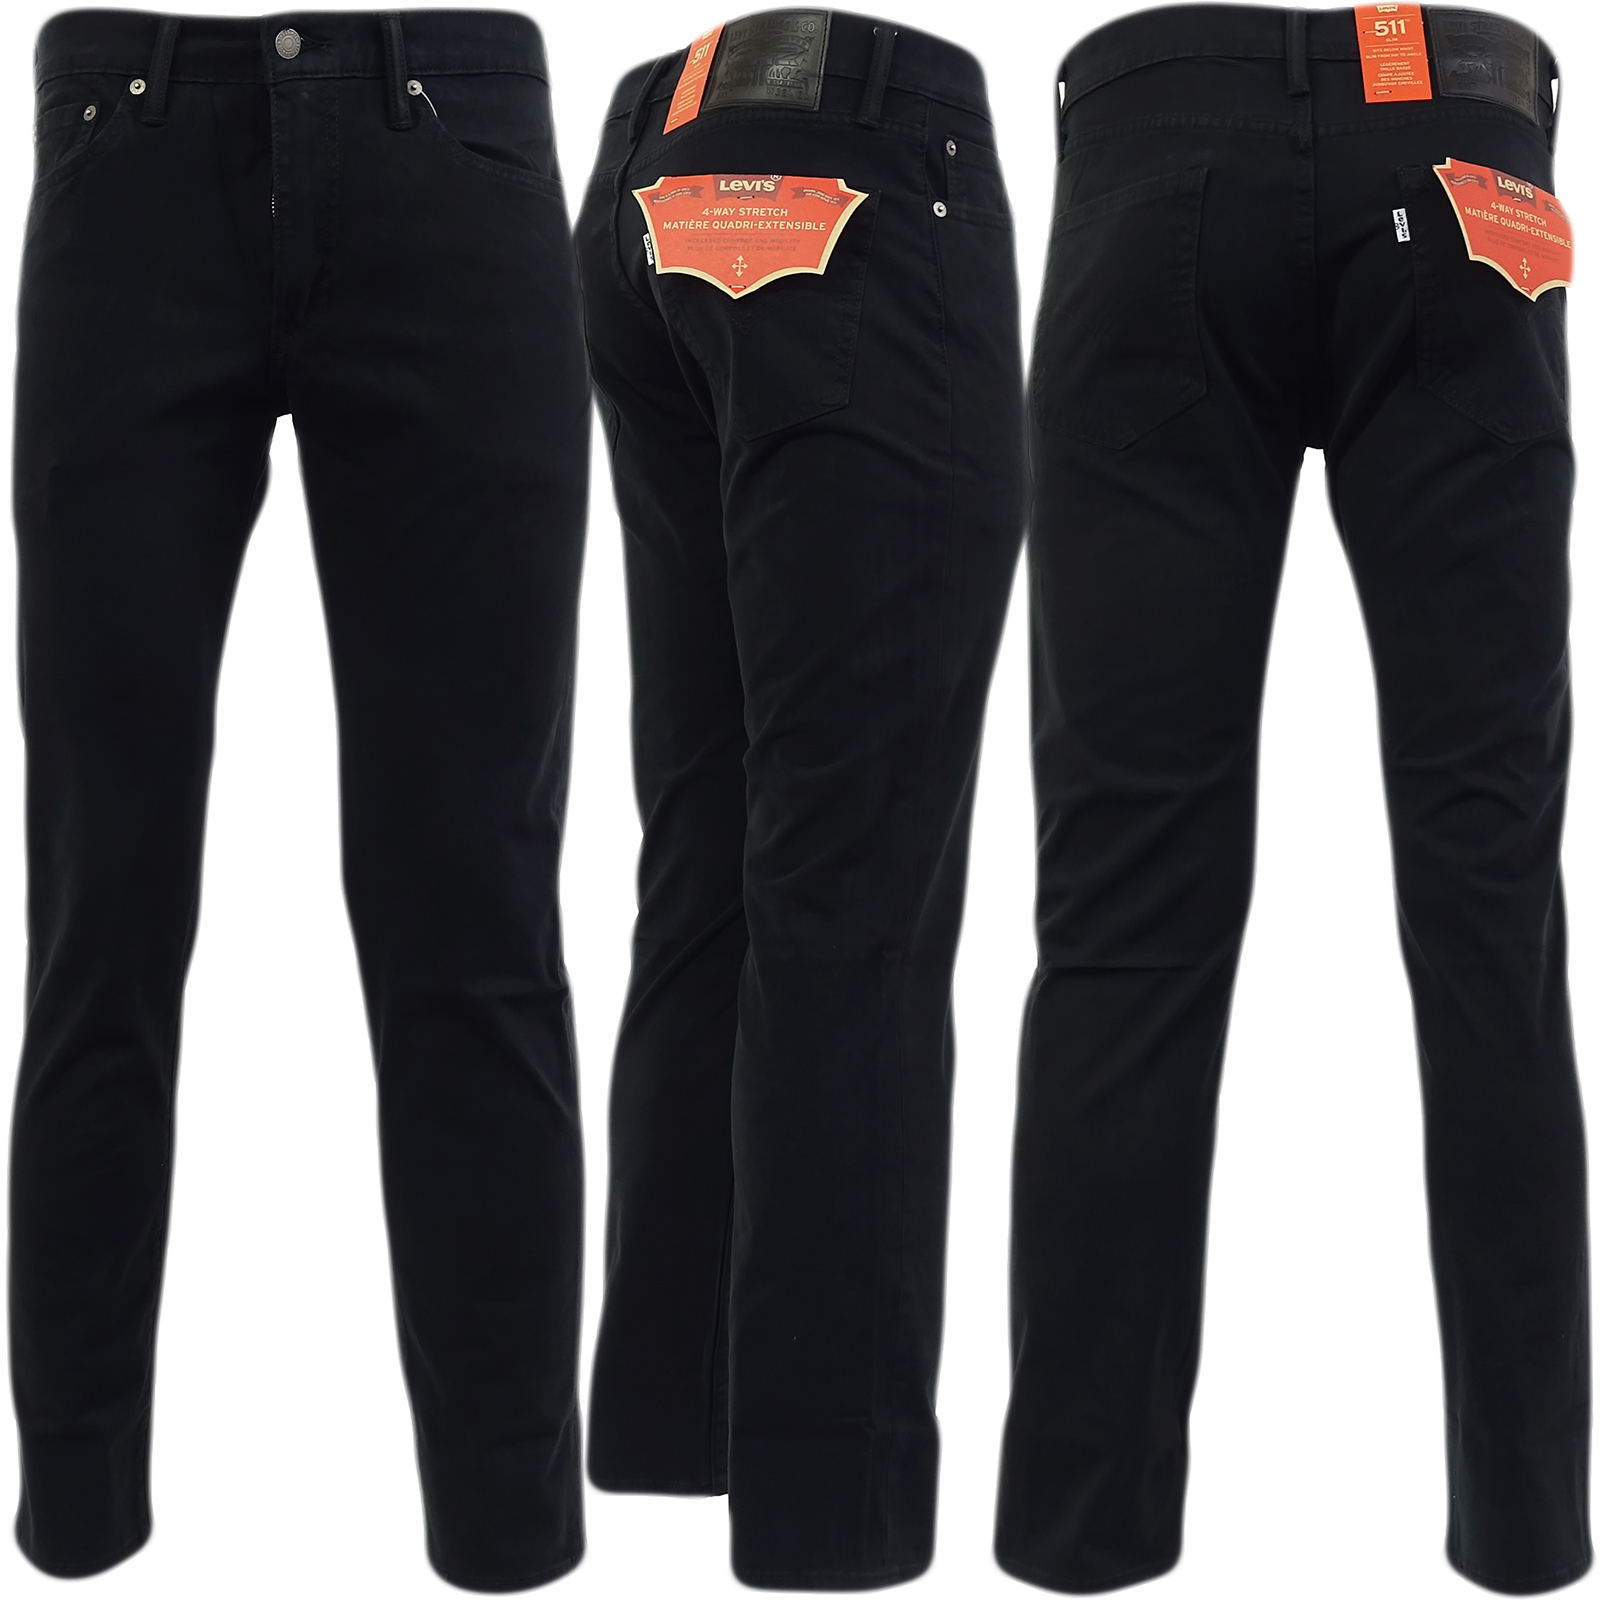 05630b806de Levi Strauss 511 Slim Leg Jean Soft Brushed Feel (Non Denim) Black ...